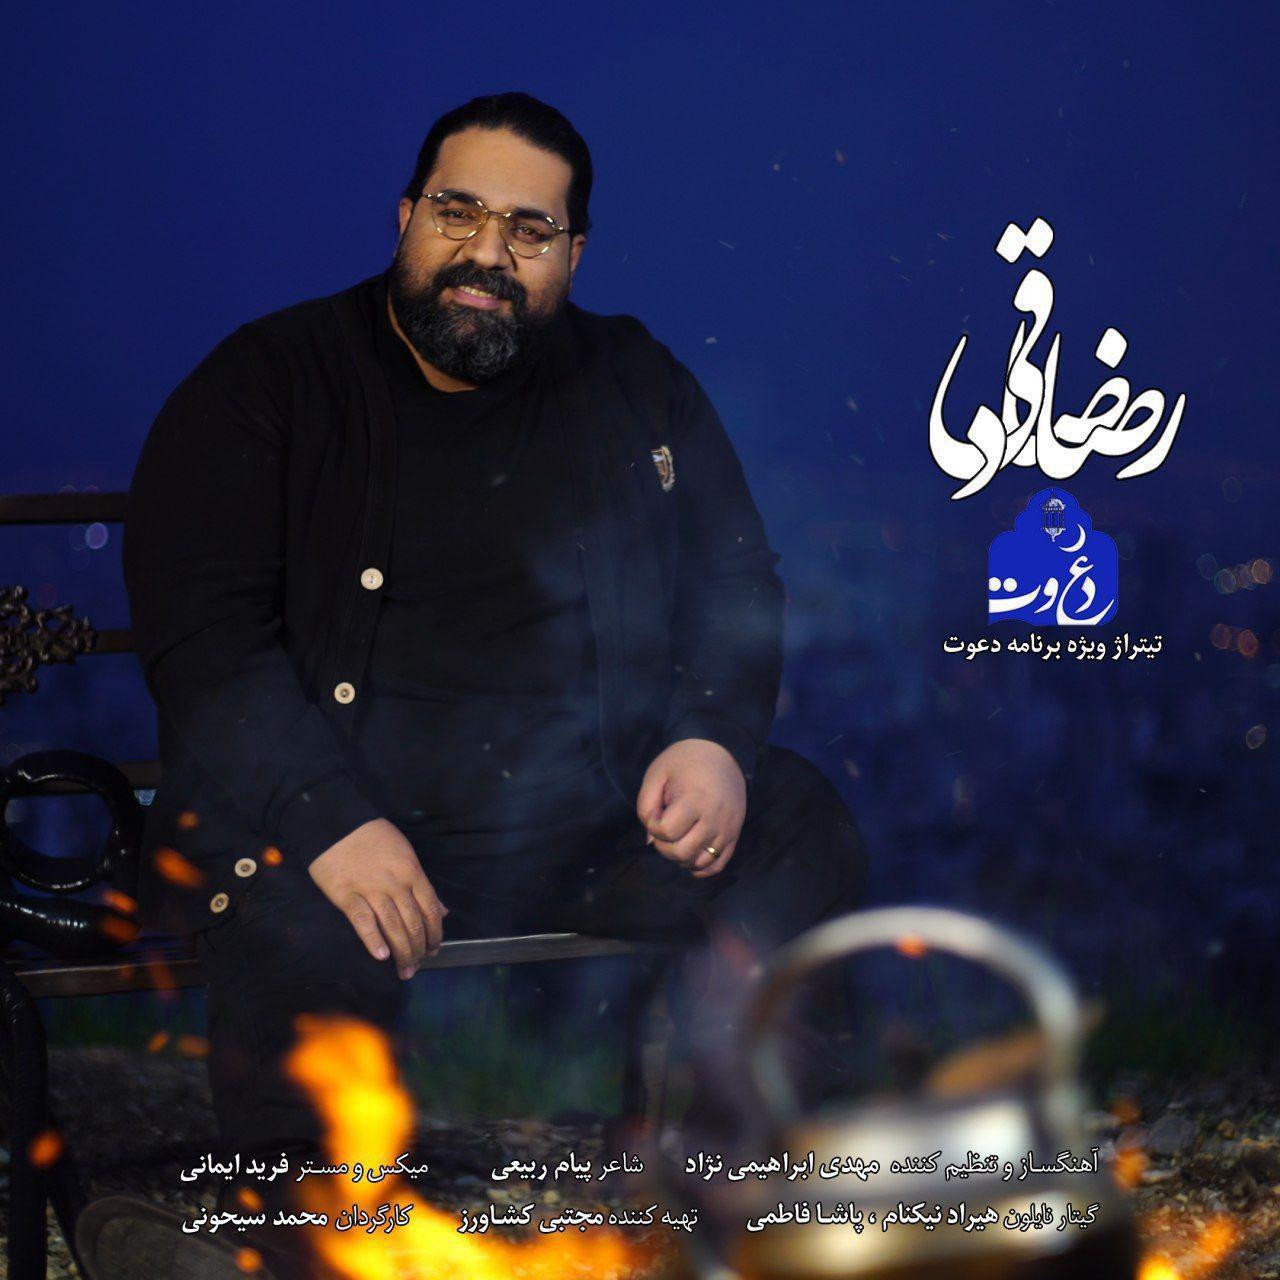 Reza Sadeghi - Davat - دانلود آهنگ رضا صادقی به نام دعوت